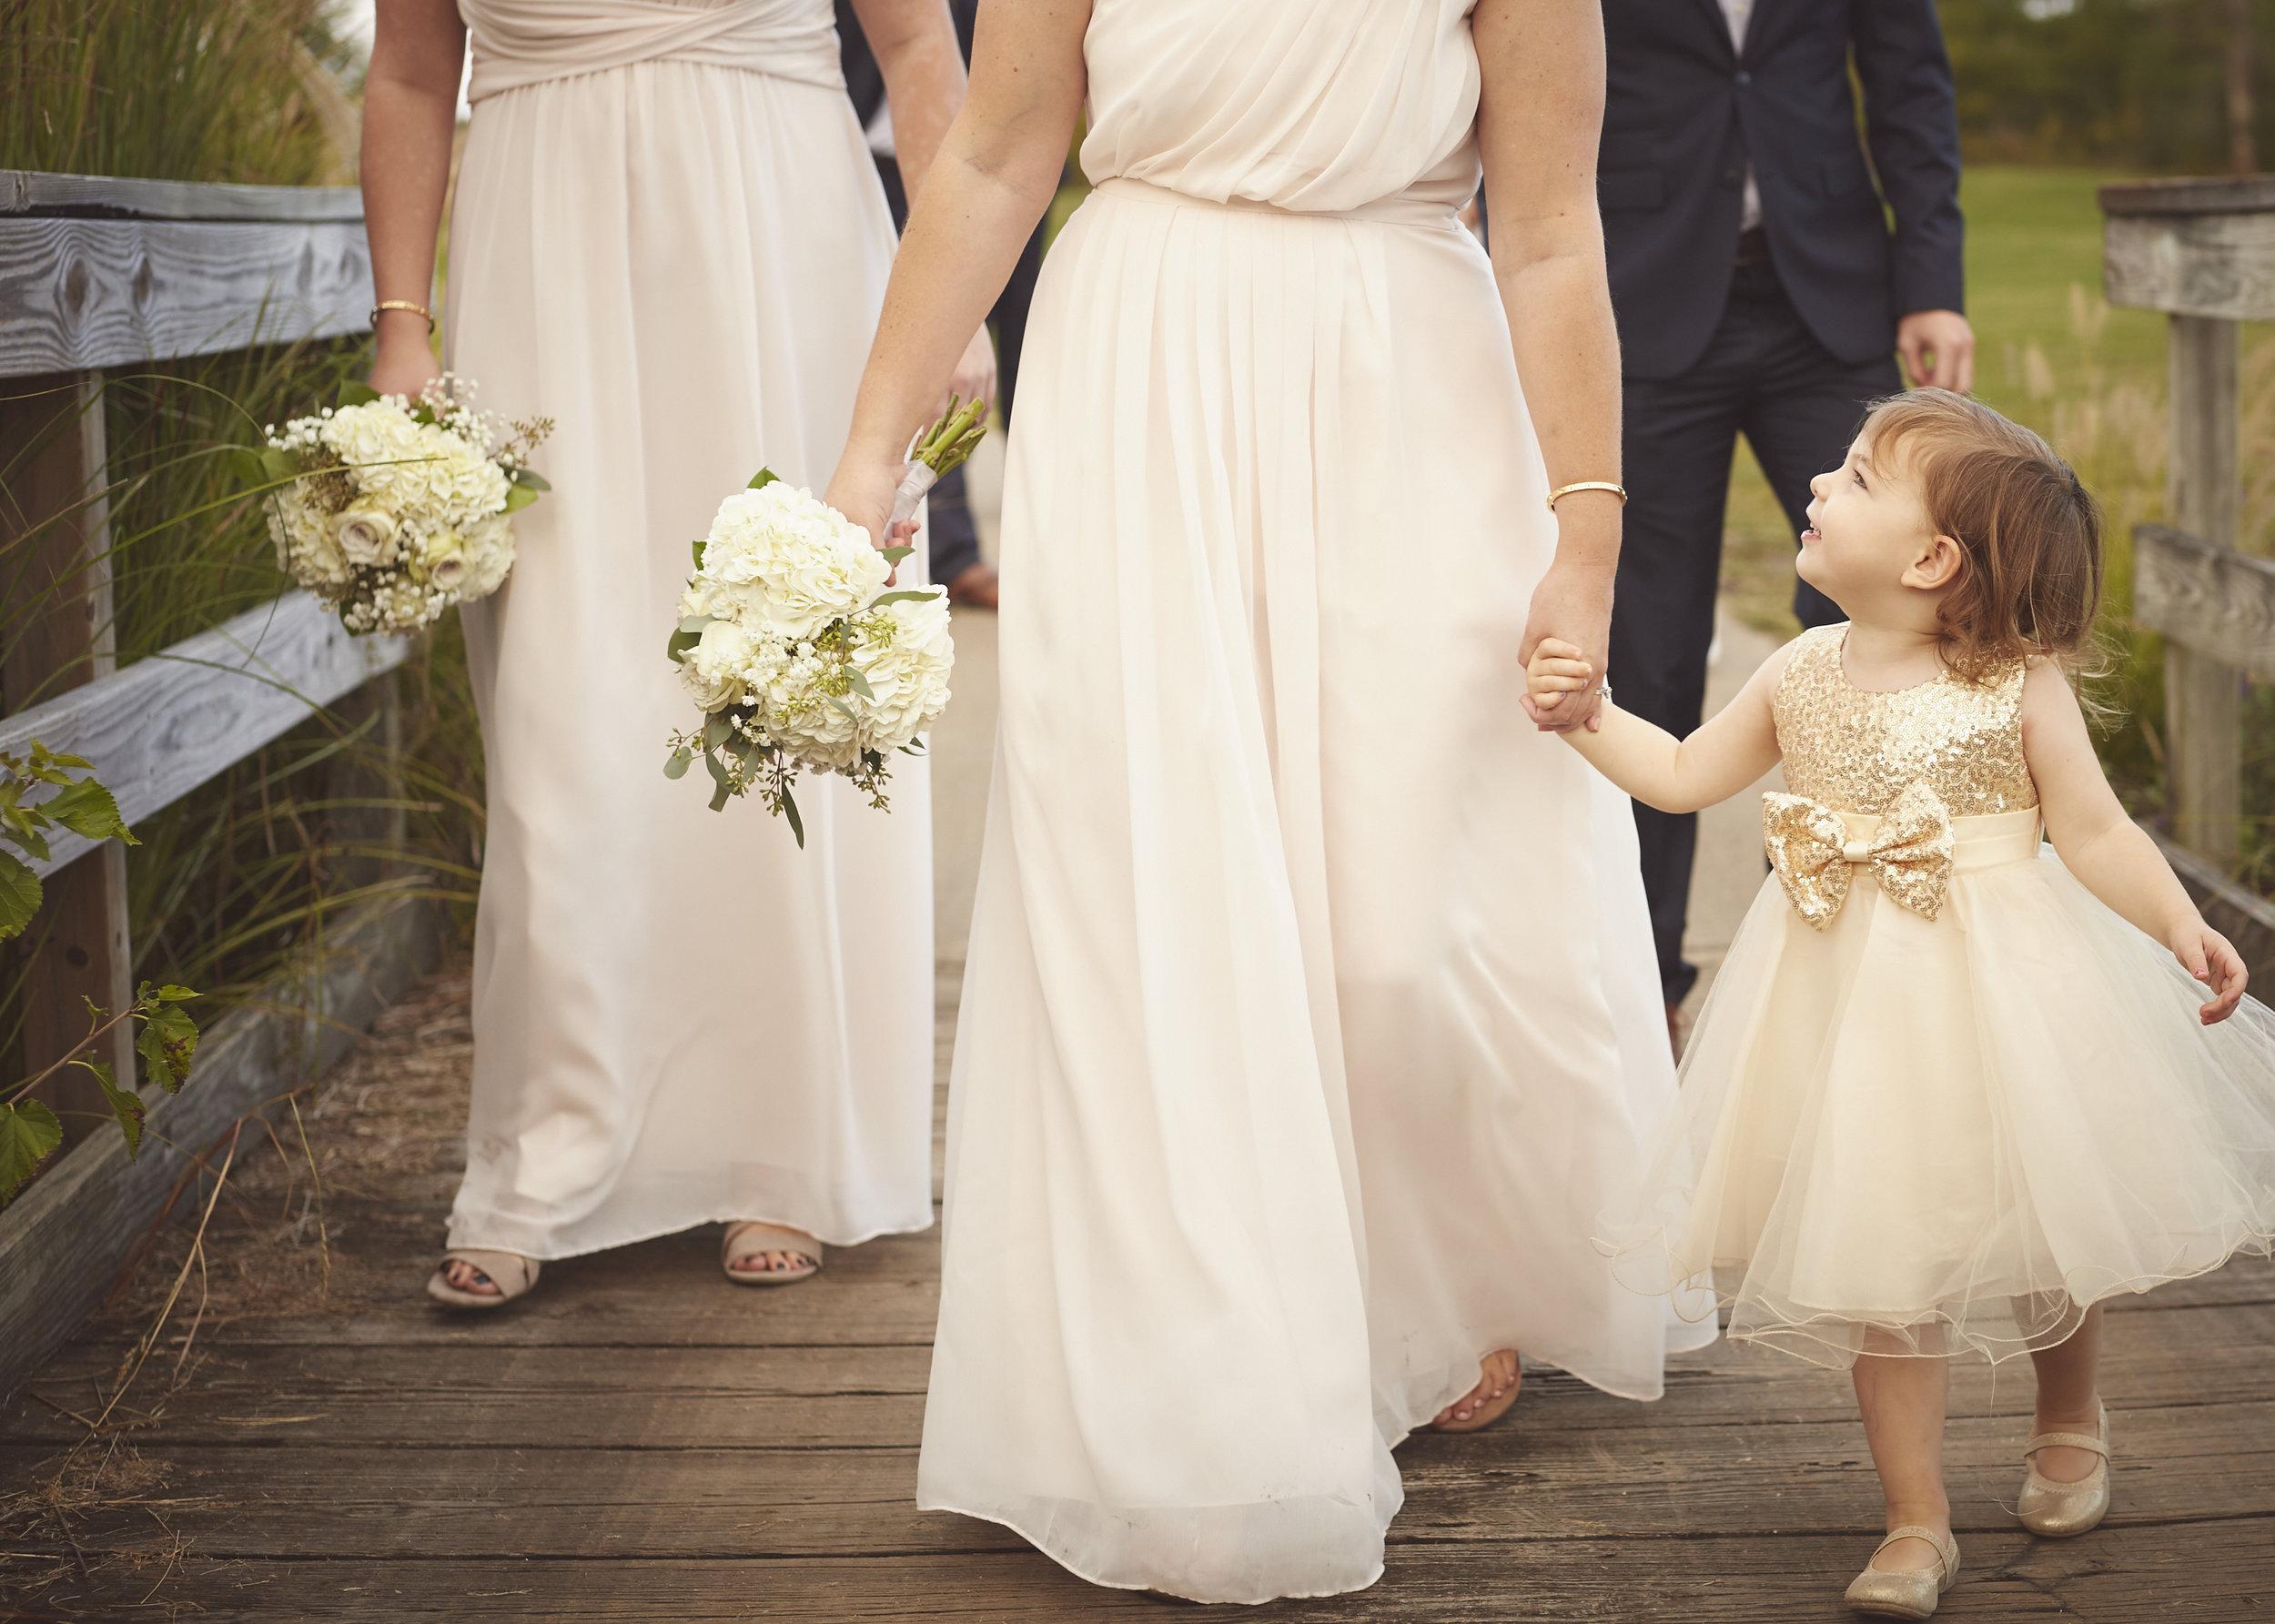 wedding party flower girl family portrait